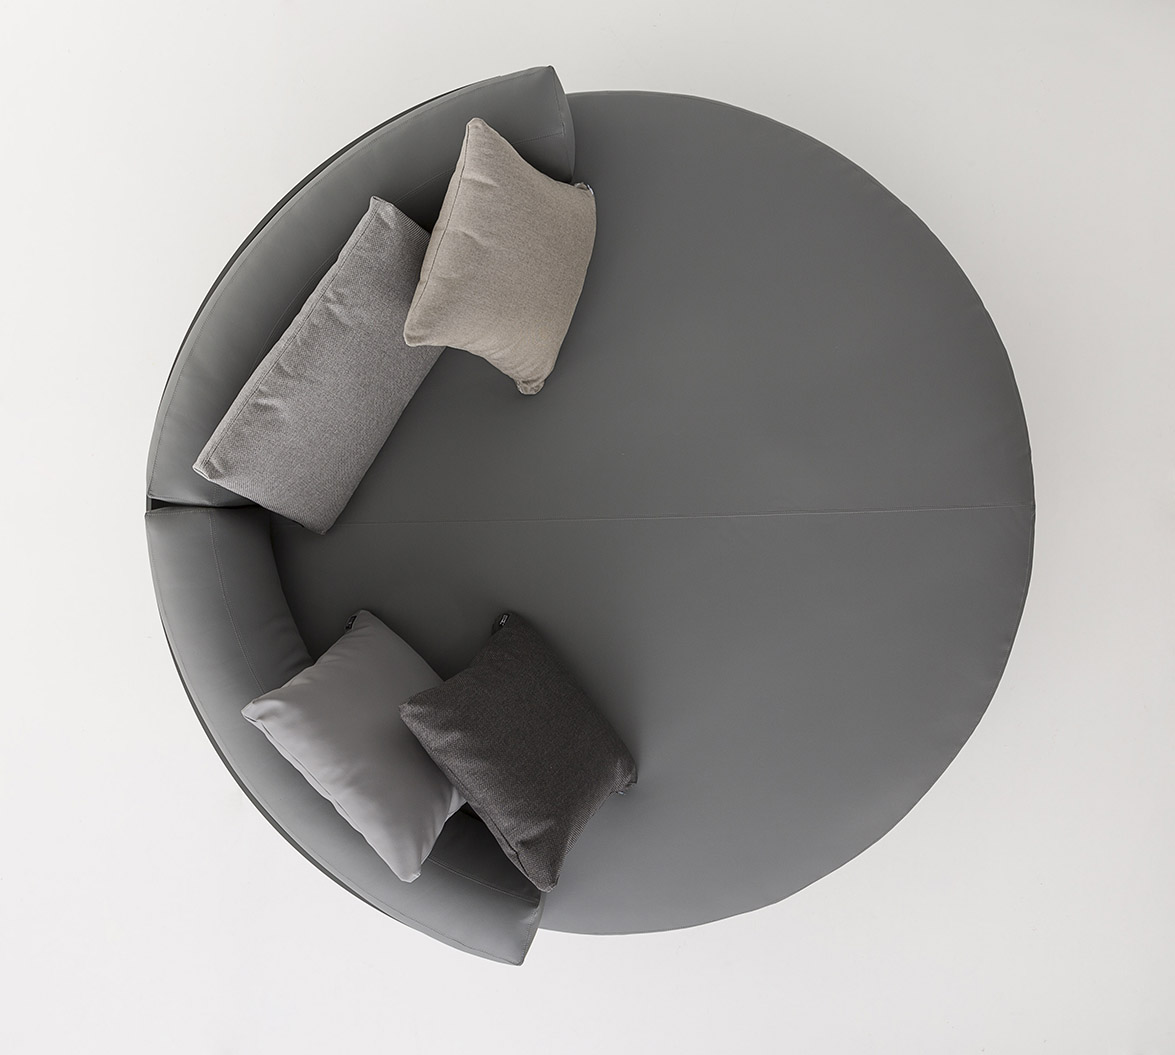 Chill Day Bed By Mario Ruiz For Gandiablasco Novelty 2016